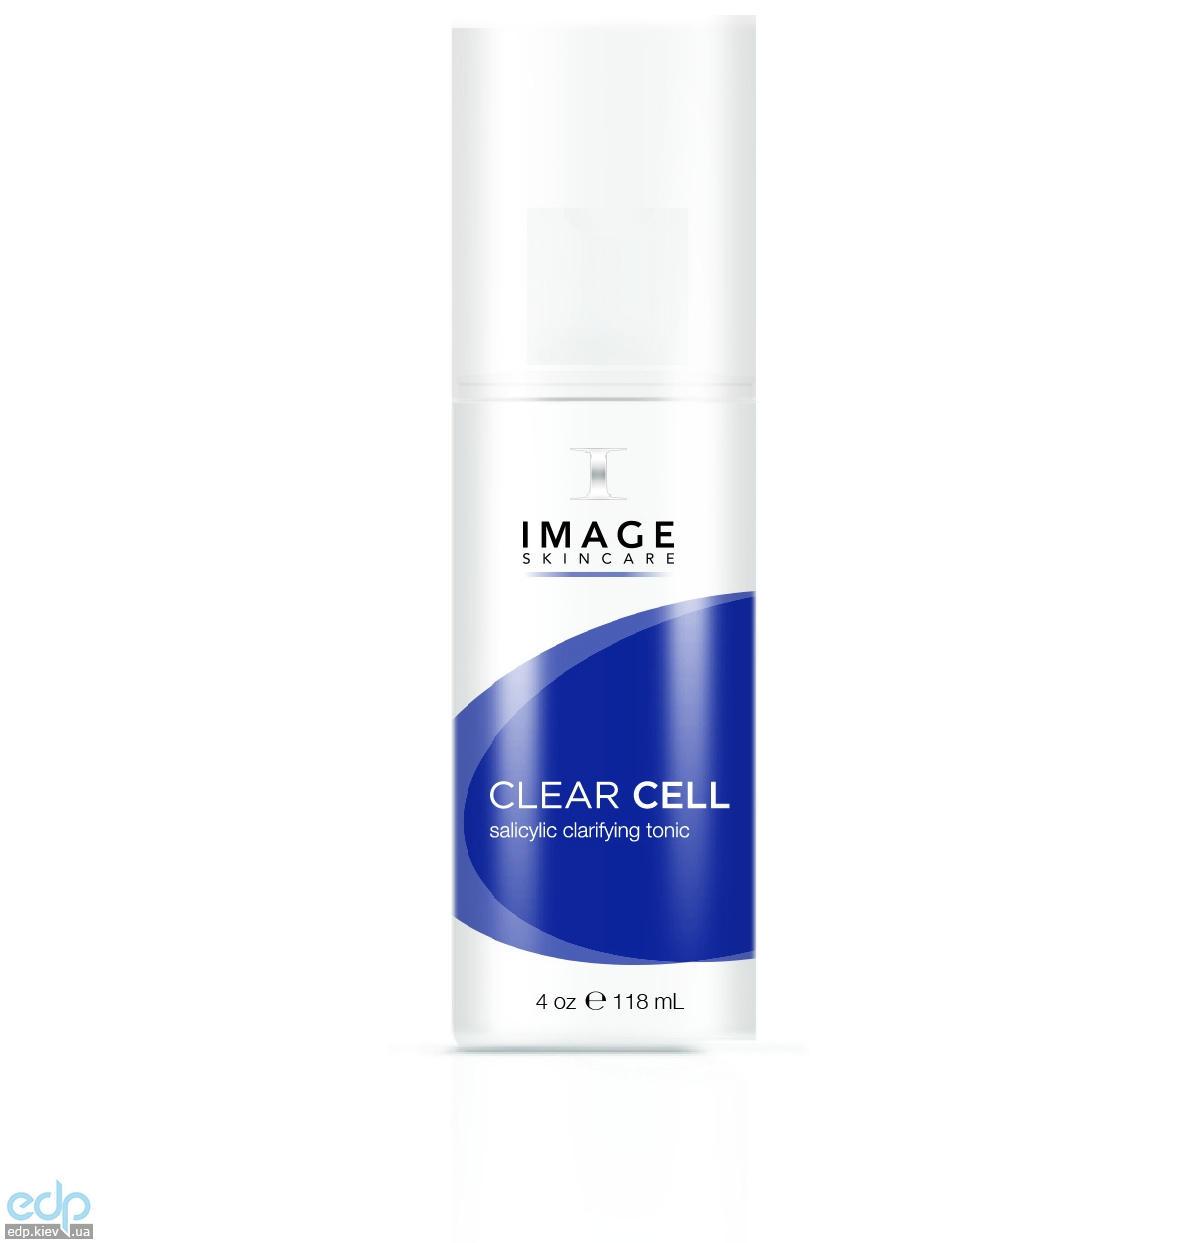 Image SkinCare - ClearCell Salicylic Clarifying Tonic - Салициловый очищающий тоник - 118 ml